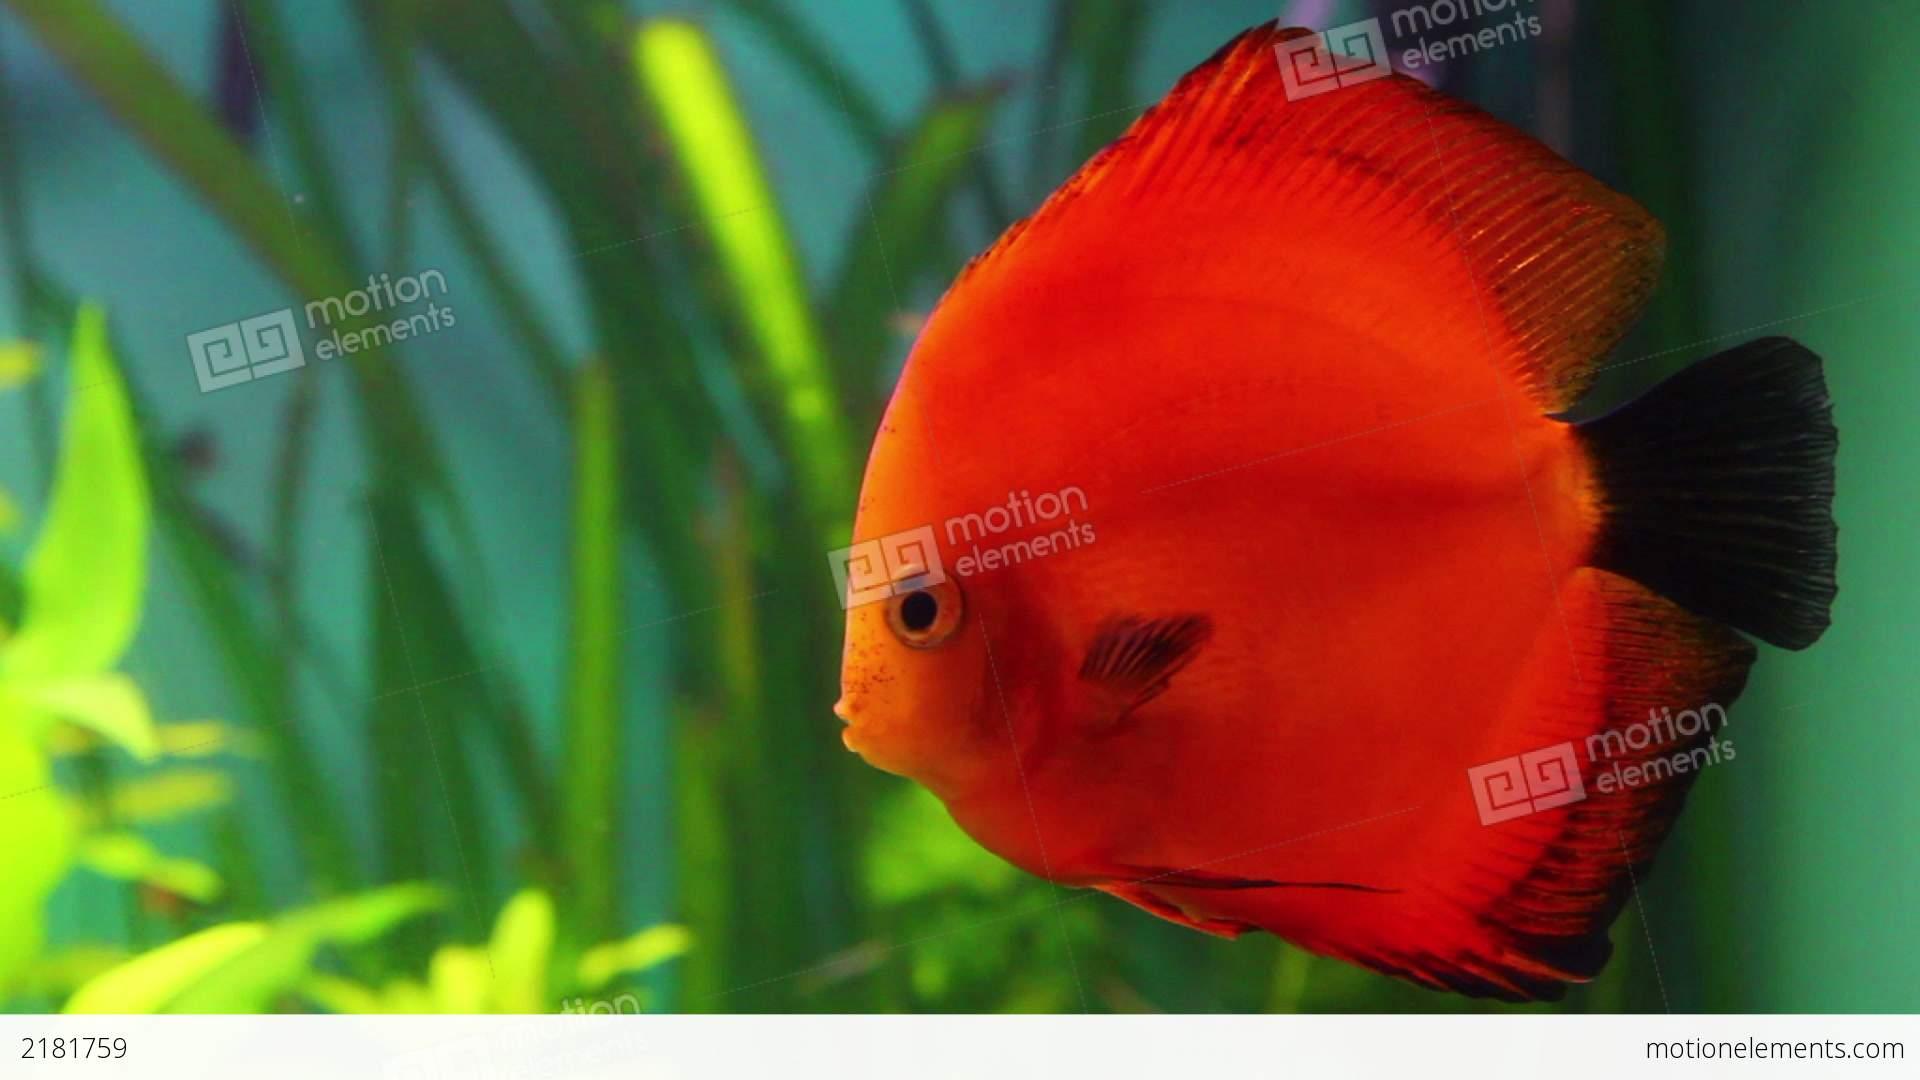 Discus Fish Images Gallery >> Aquascaping Red Rose Discus Fish 5 6 ...